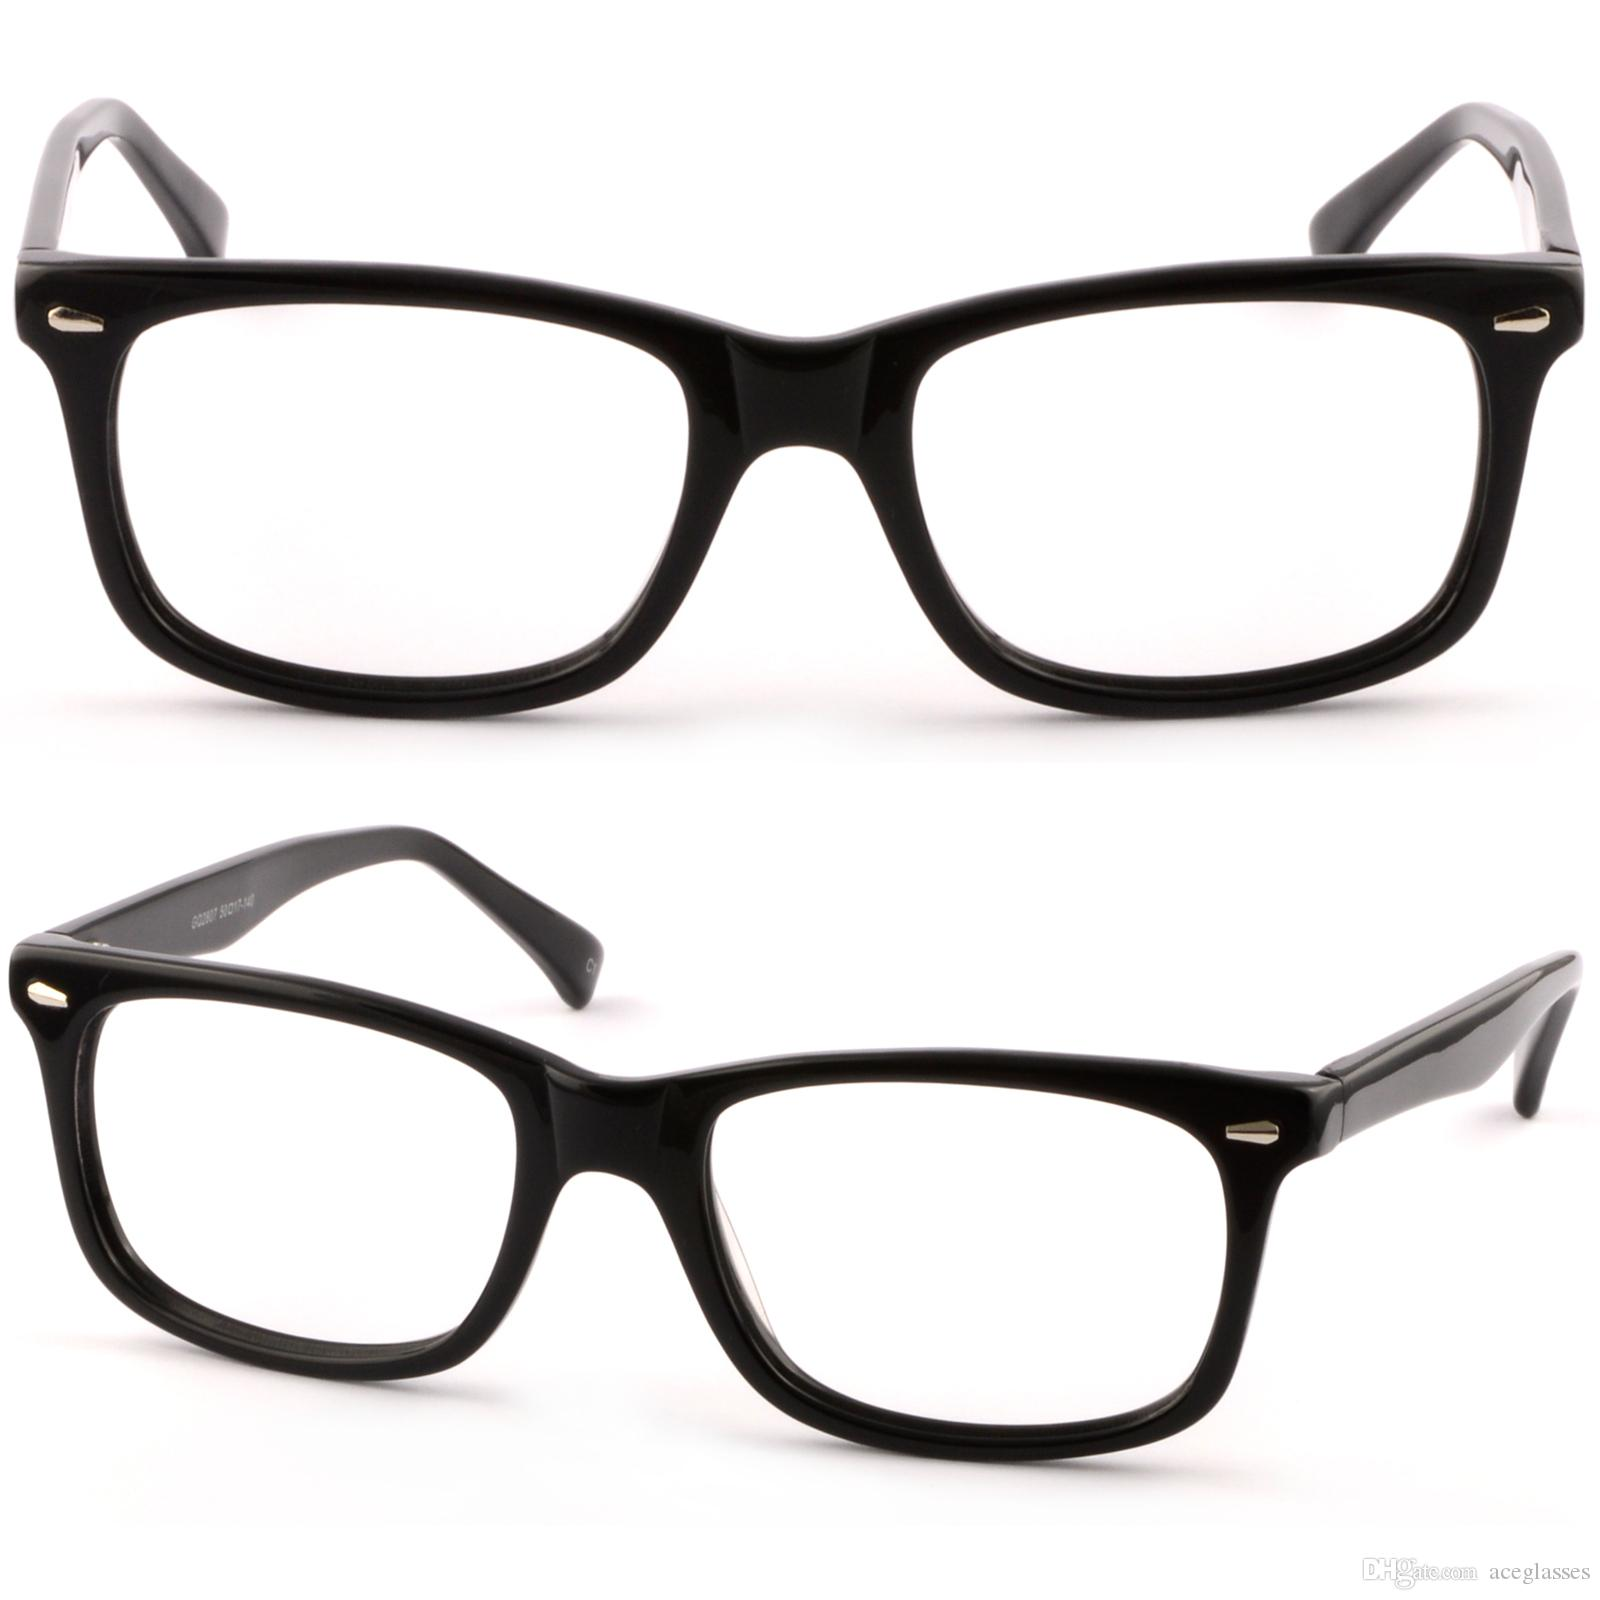 885f6777622 Rectangular Womens Acetate Frames Prescription Glasses Lenses Shiny Pieces  Black Designer Eyeglass Frames Online Discontinued Eyeglass Frames From ...